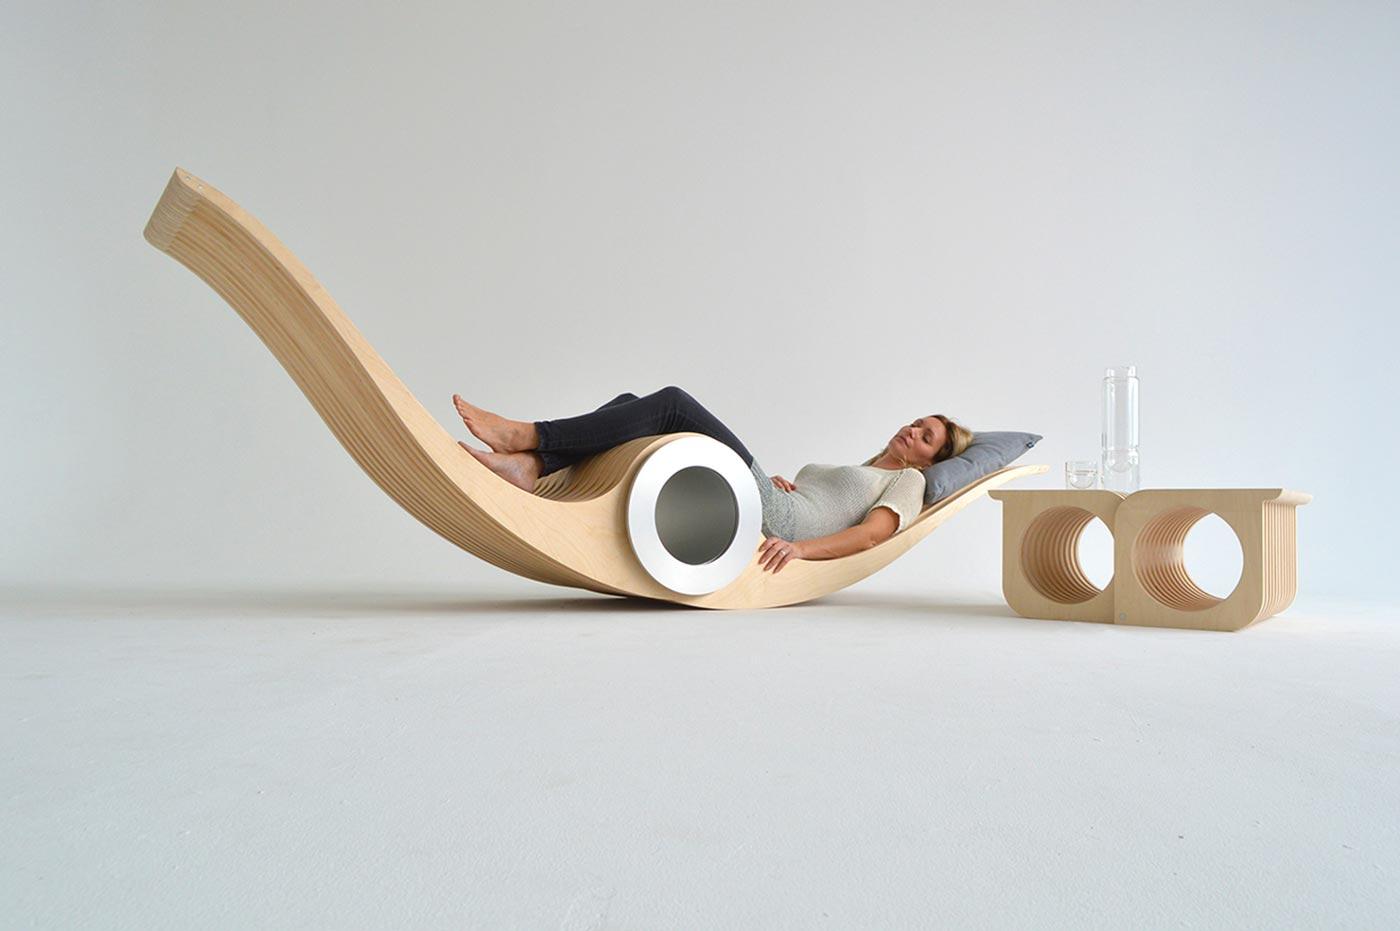 exocet-a-versatile-and-ergonomic-chair-by-designarium-11